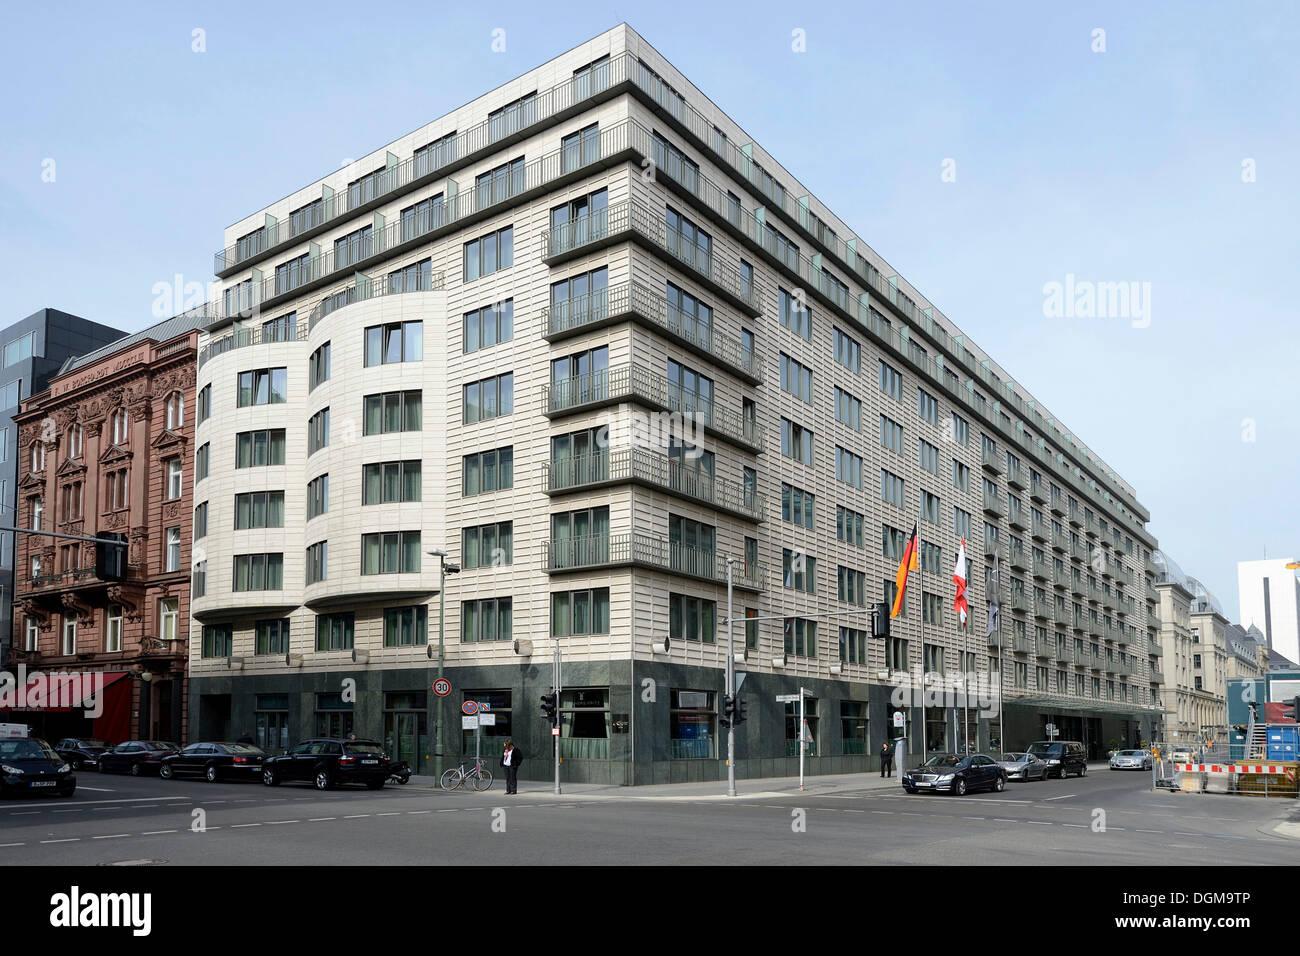 The Regent, a 5-star hotel, Berlin, Gendarmenmarkt square - Stock Image